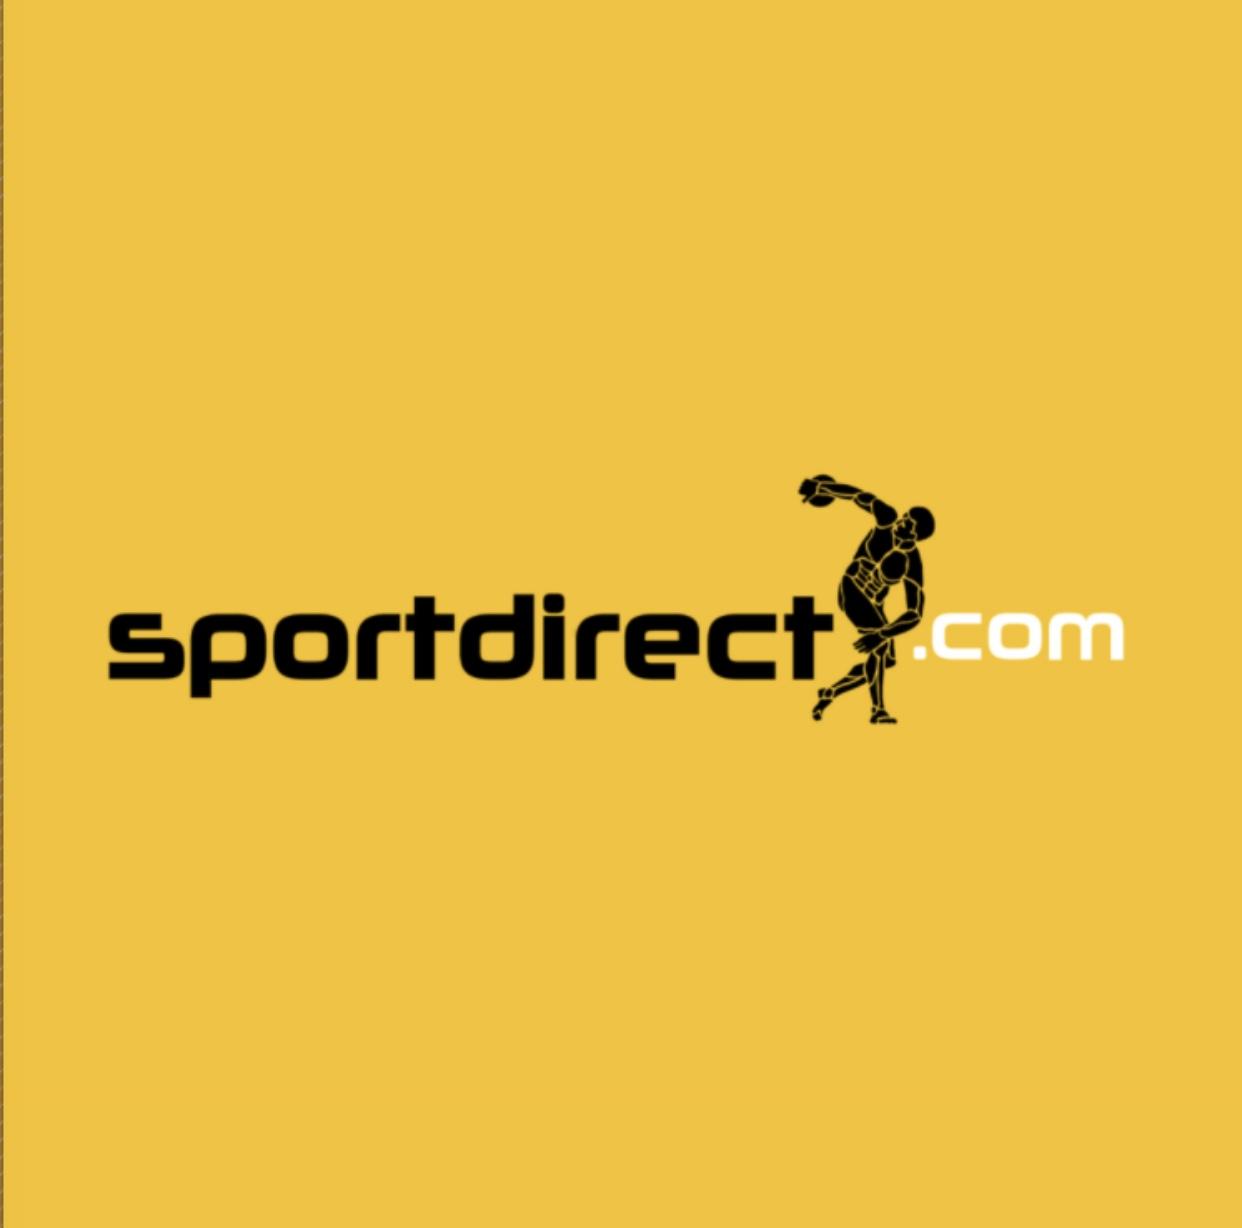 Sportkleding tegen outletprijzen tijdens de Sportdirect outlet